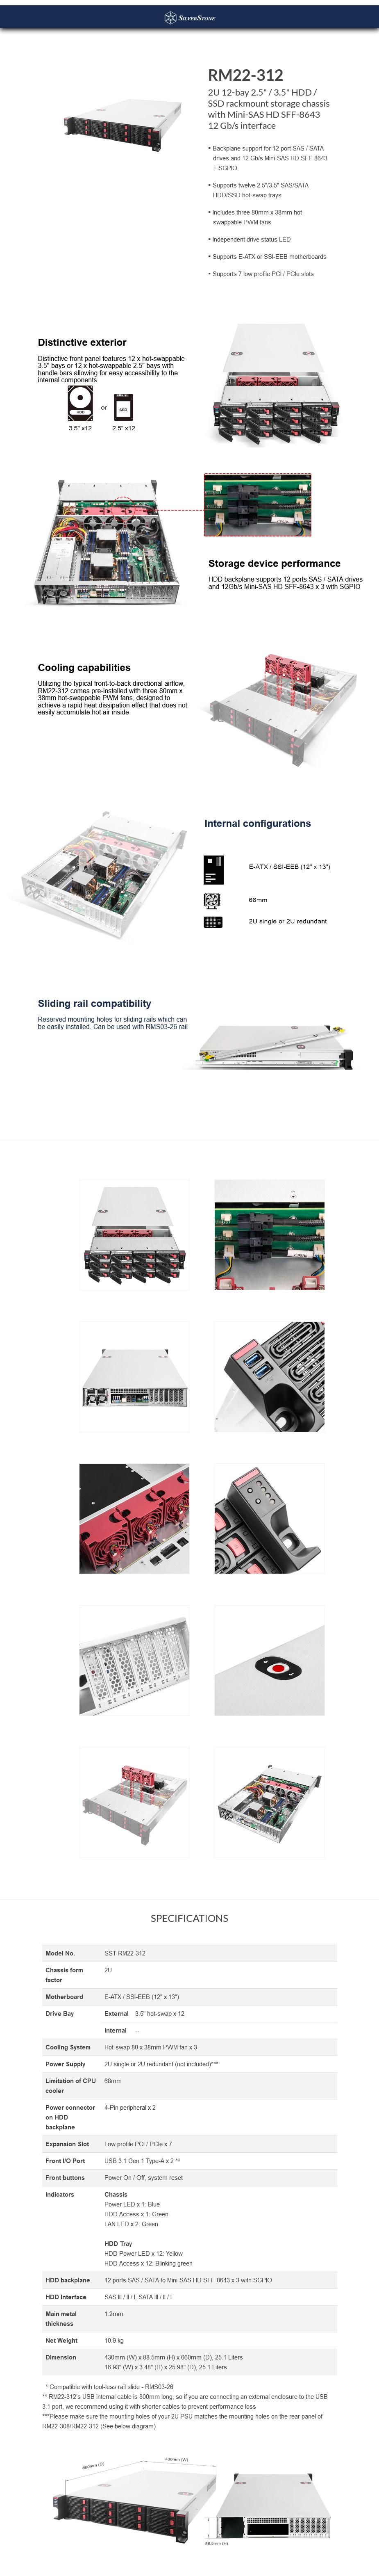 silverstone-rm22312-2u-12bay-rackmount-server-case-ac45817-2.jpg